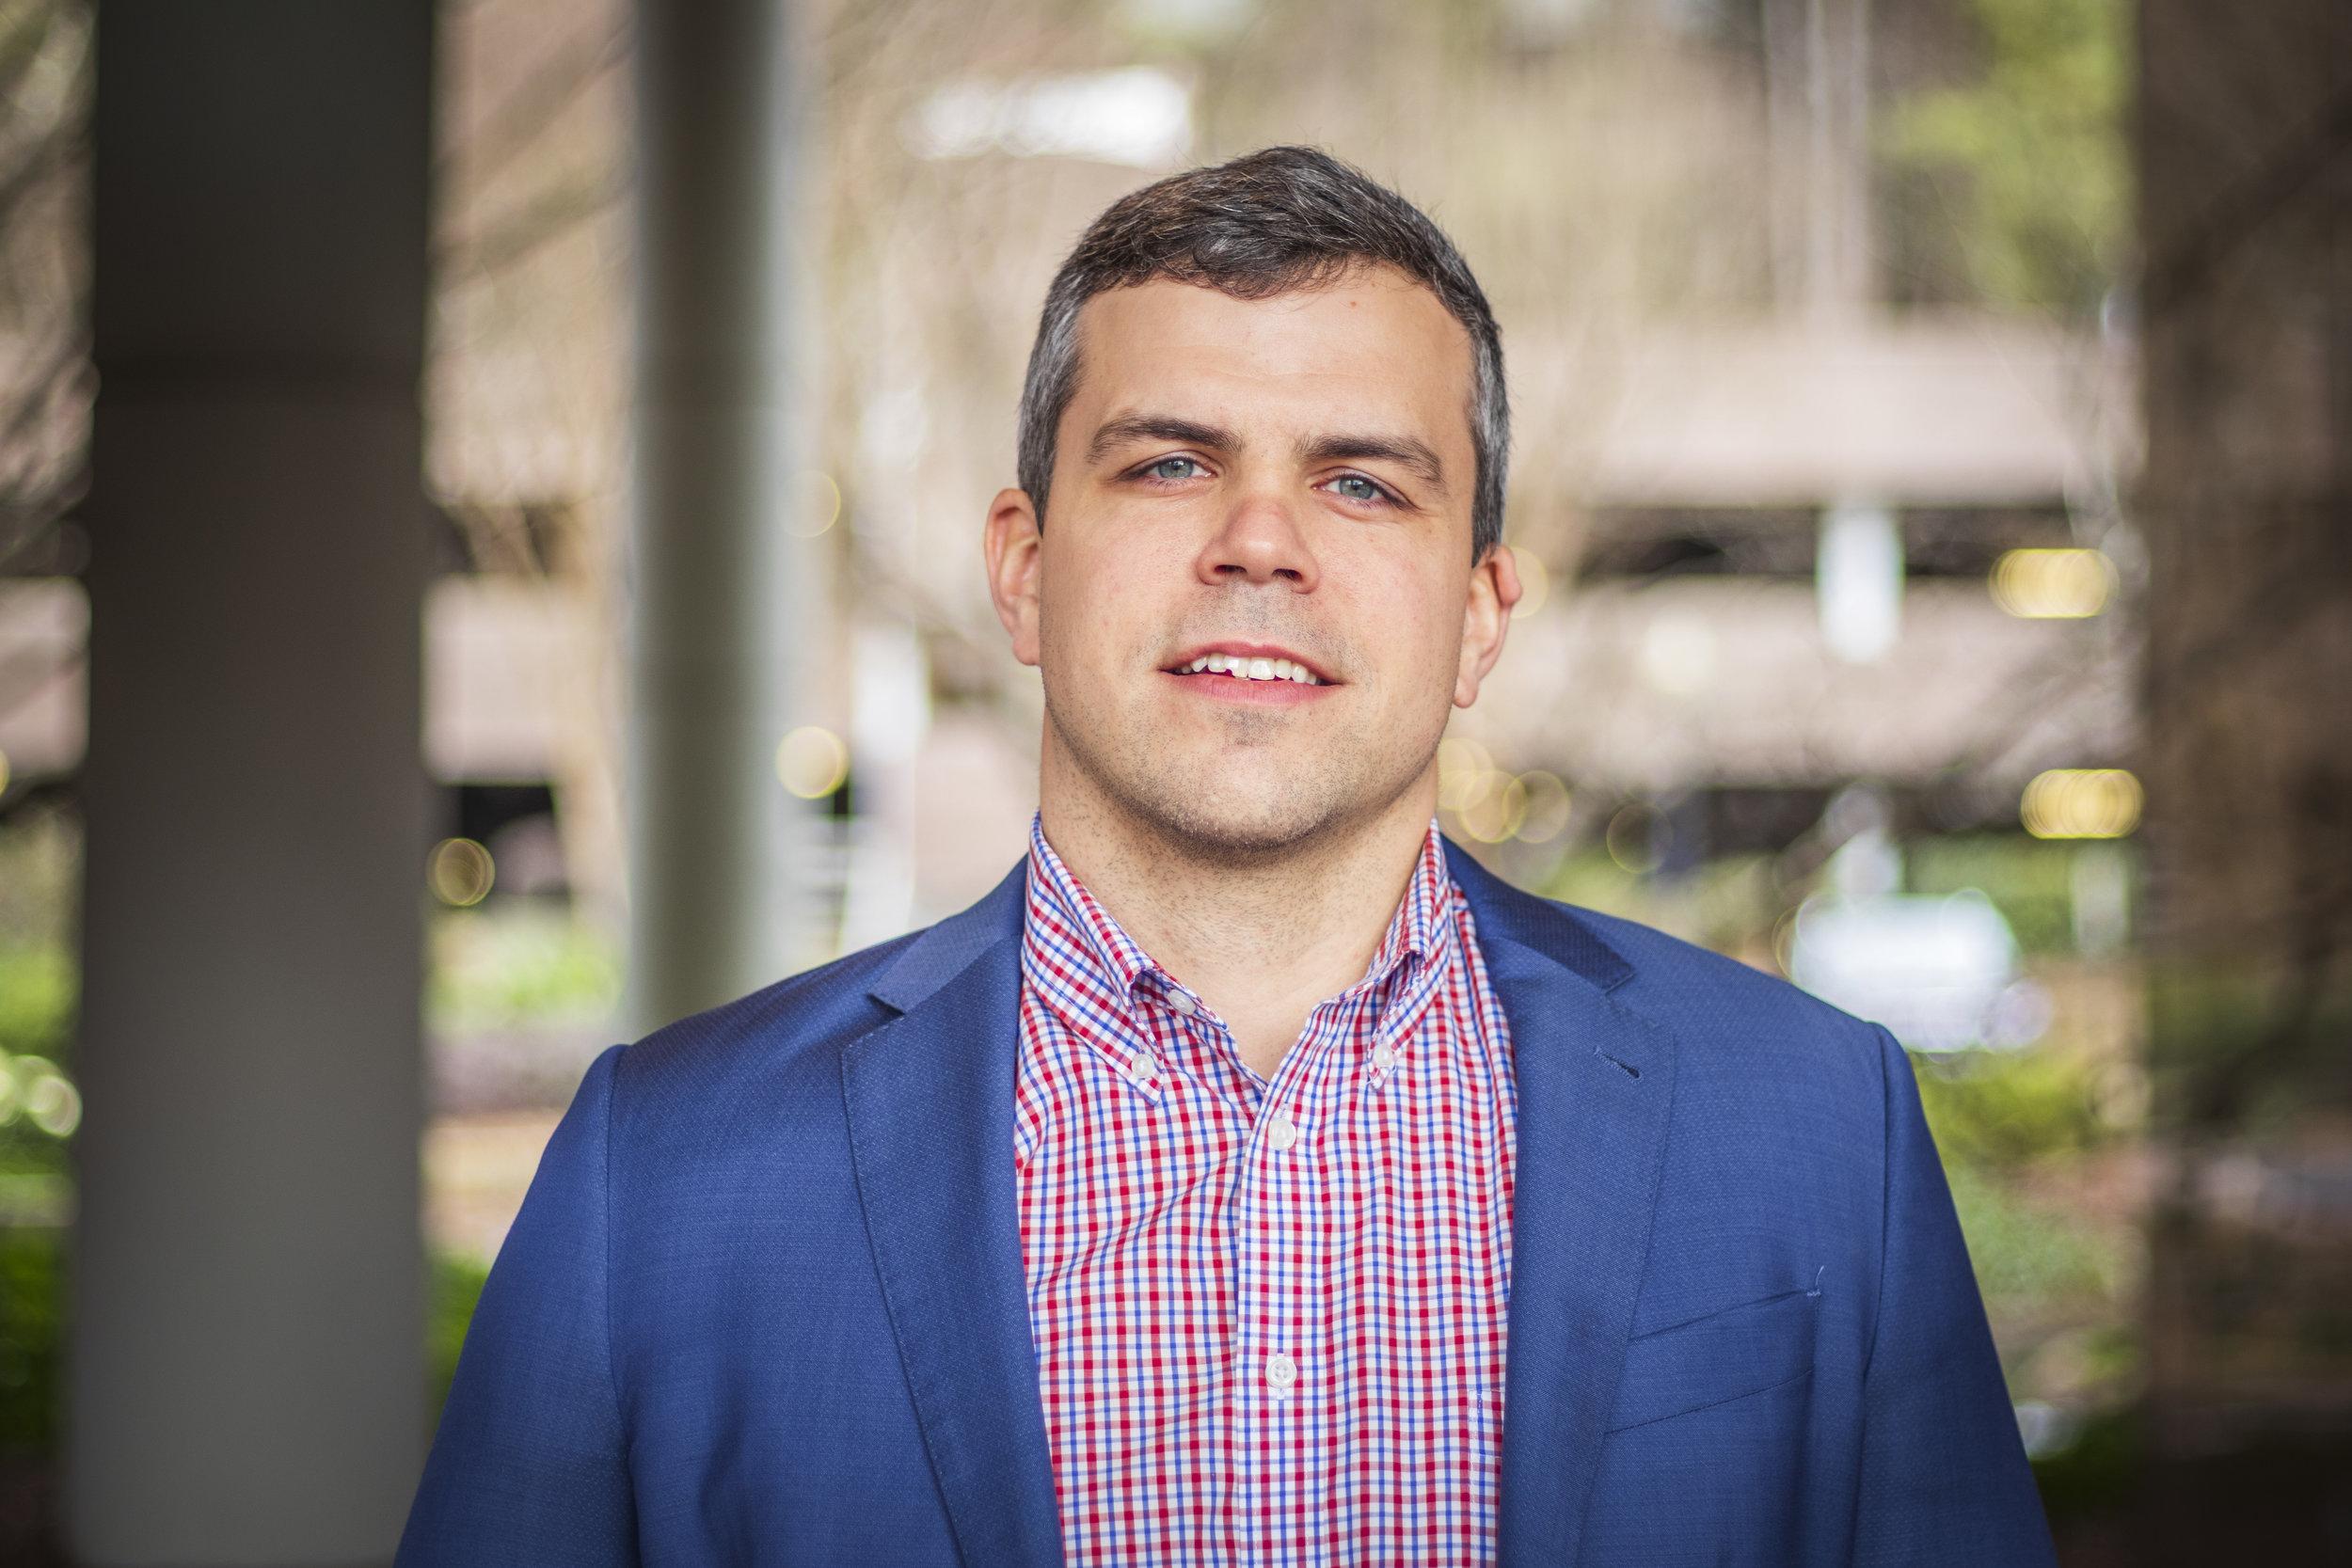 Randy Fuerstenberg - Director of Talent Development